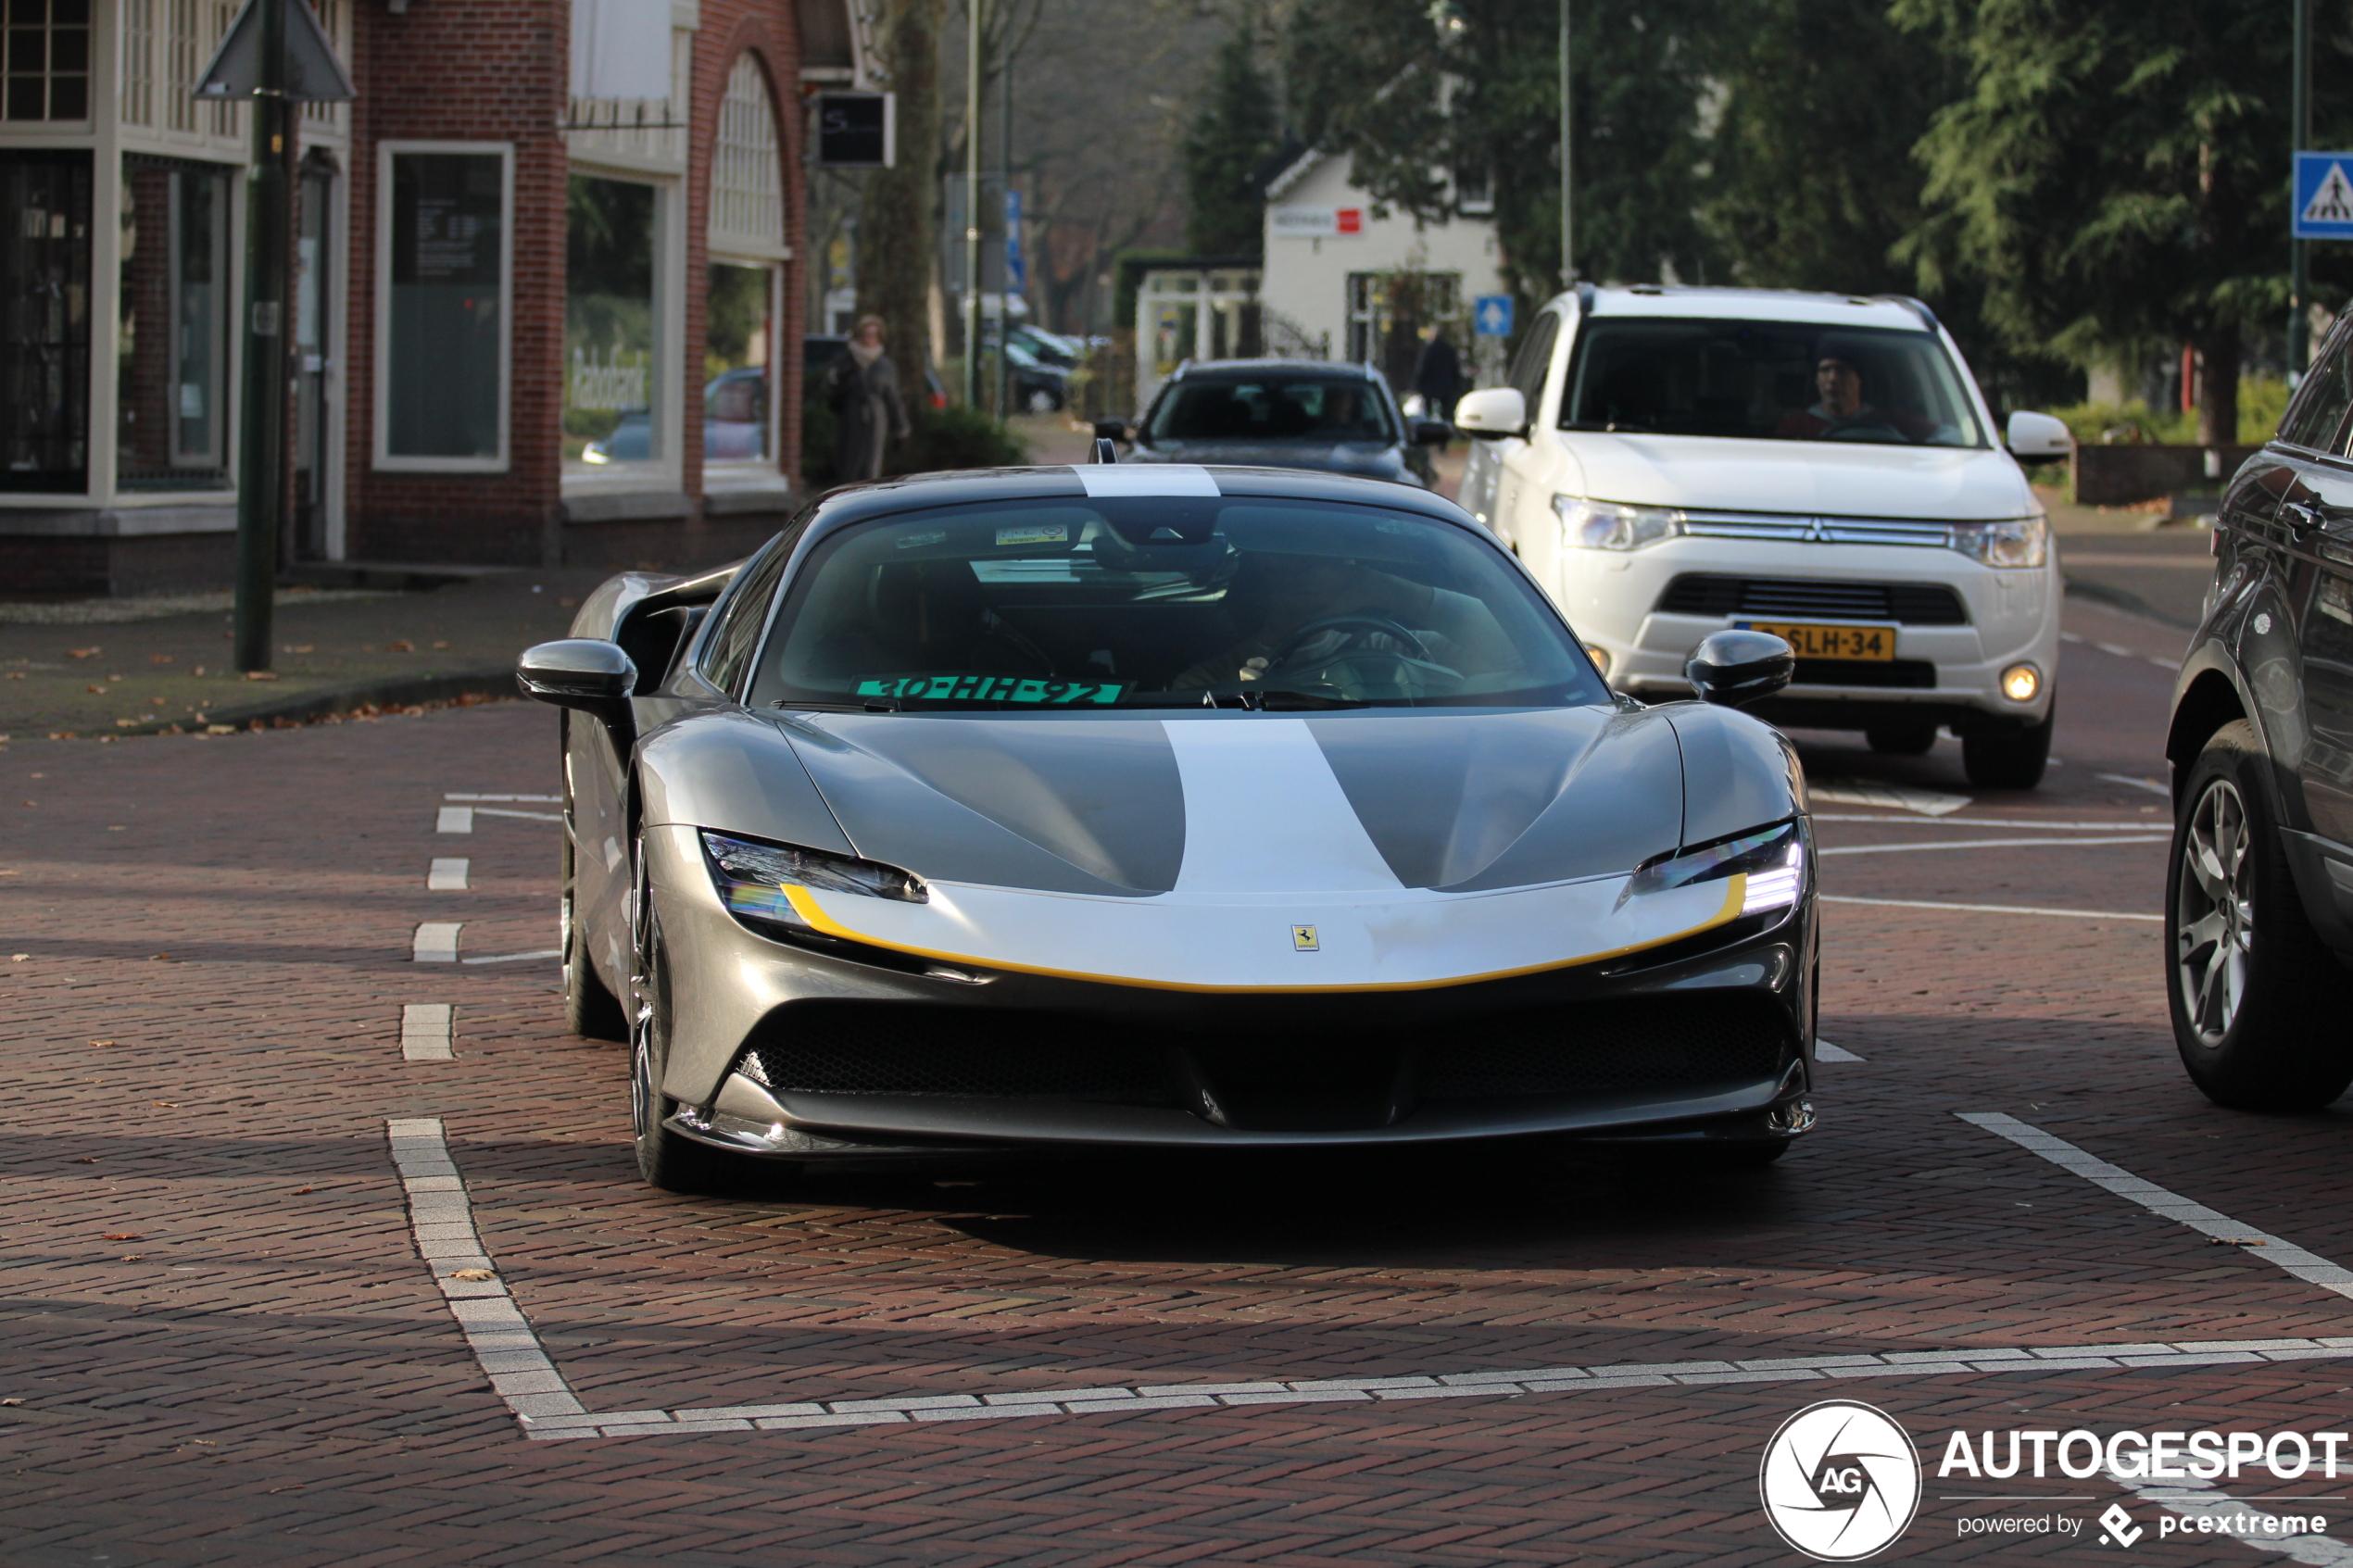 Primeur in Laren: Ferrari SF90 Stradale!